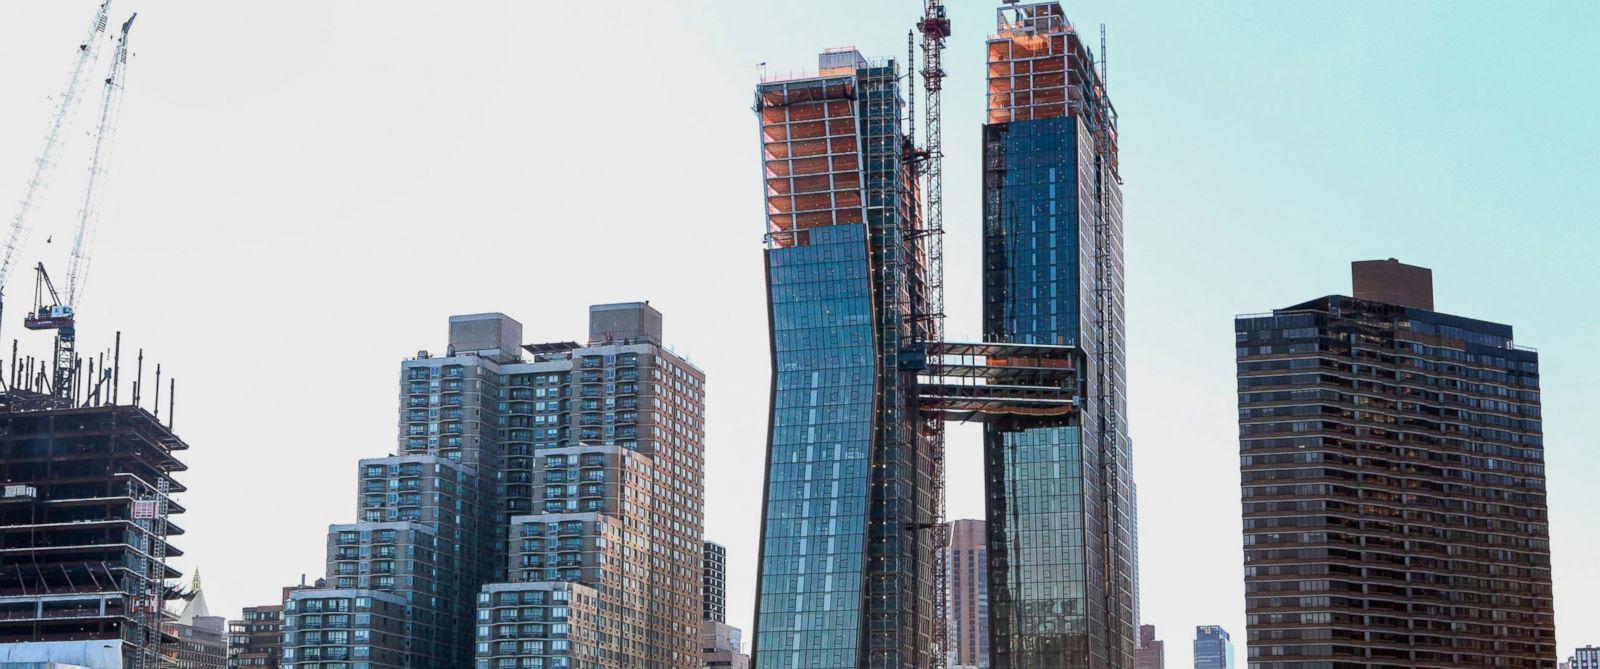 City Under Construction Stock Photo - Image: 15819030 |City Under Construction